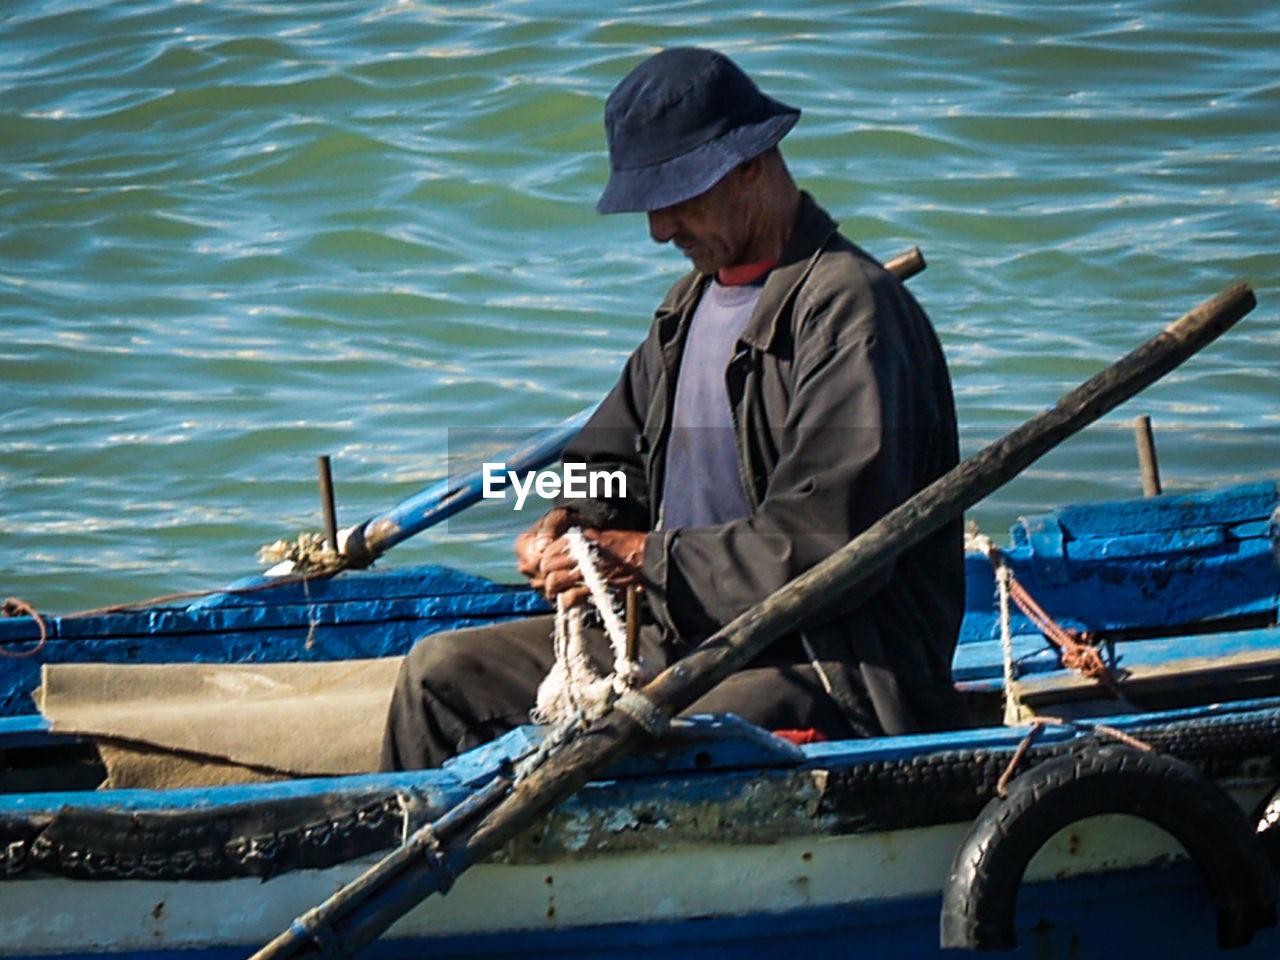 MAN FISHING BOAT SAILING IN SEA